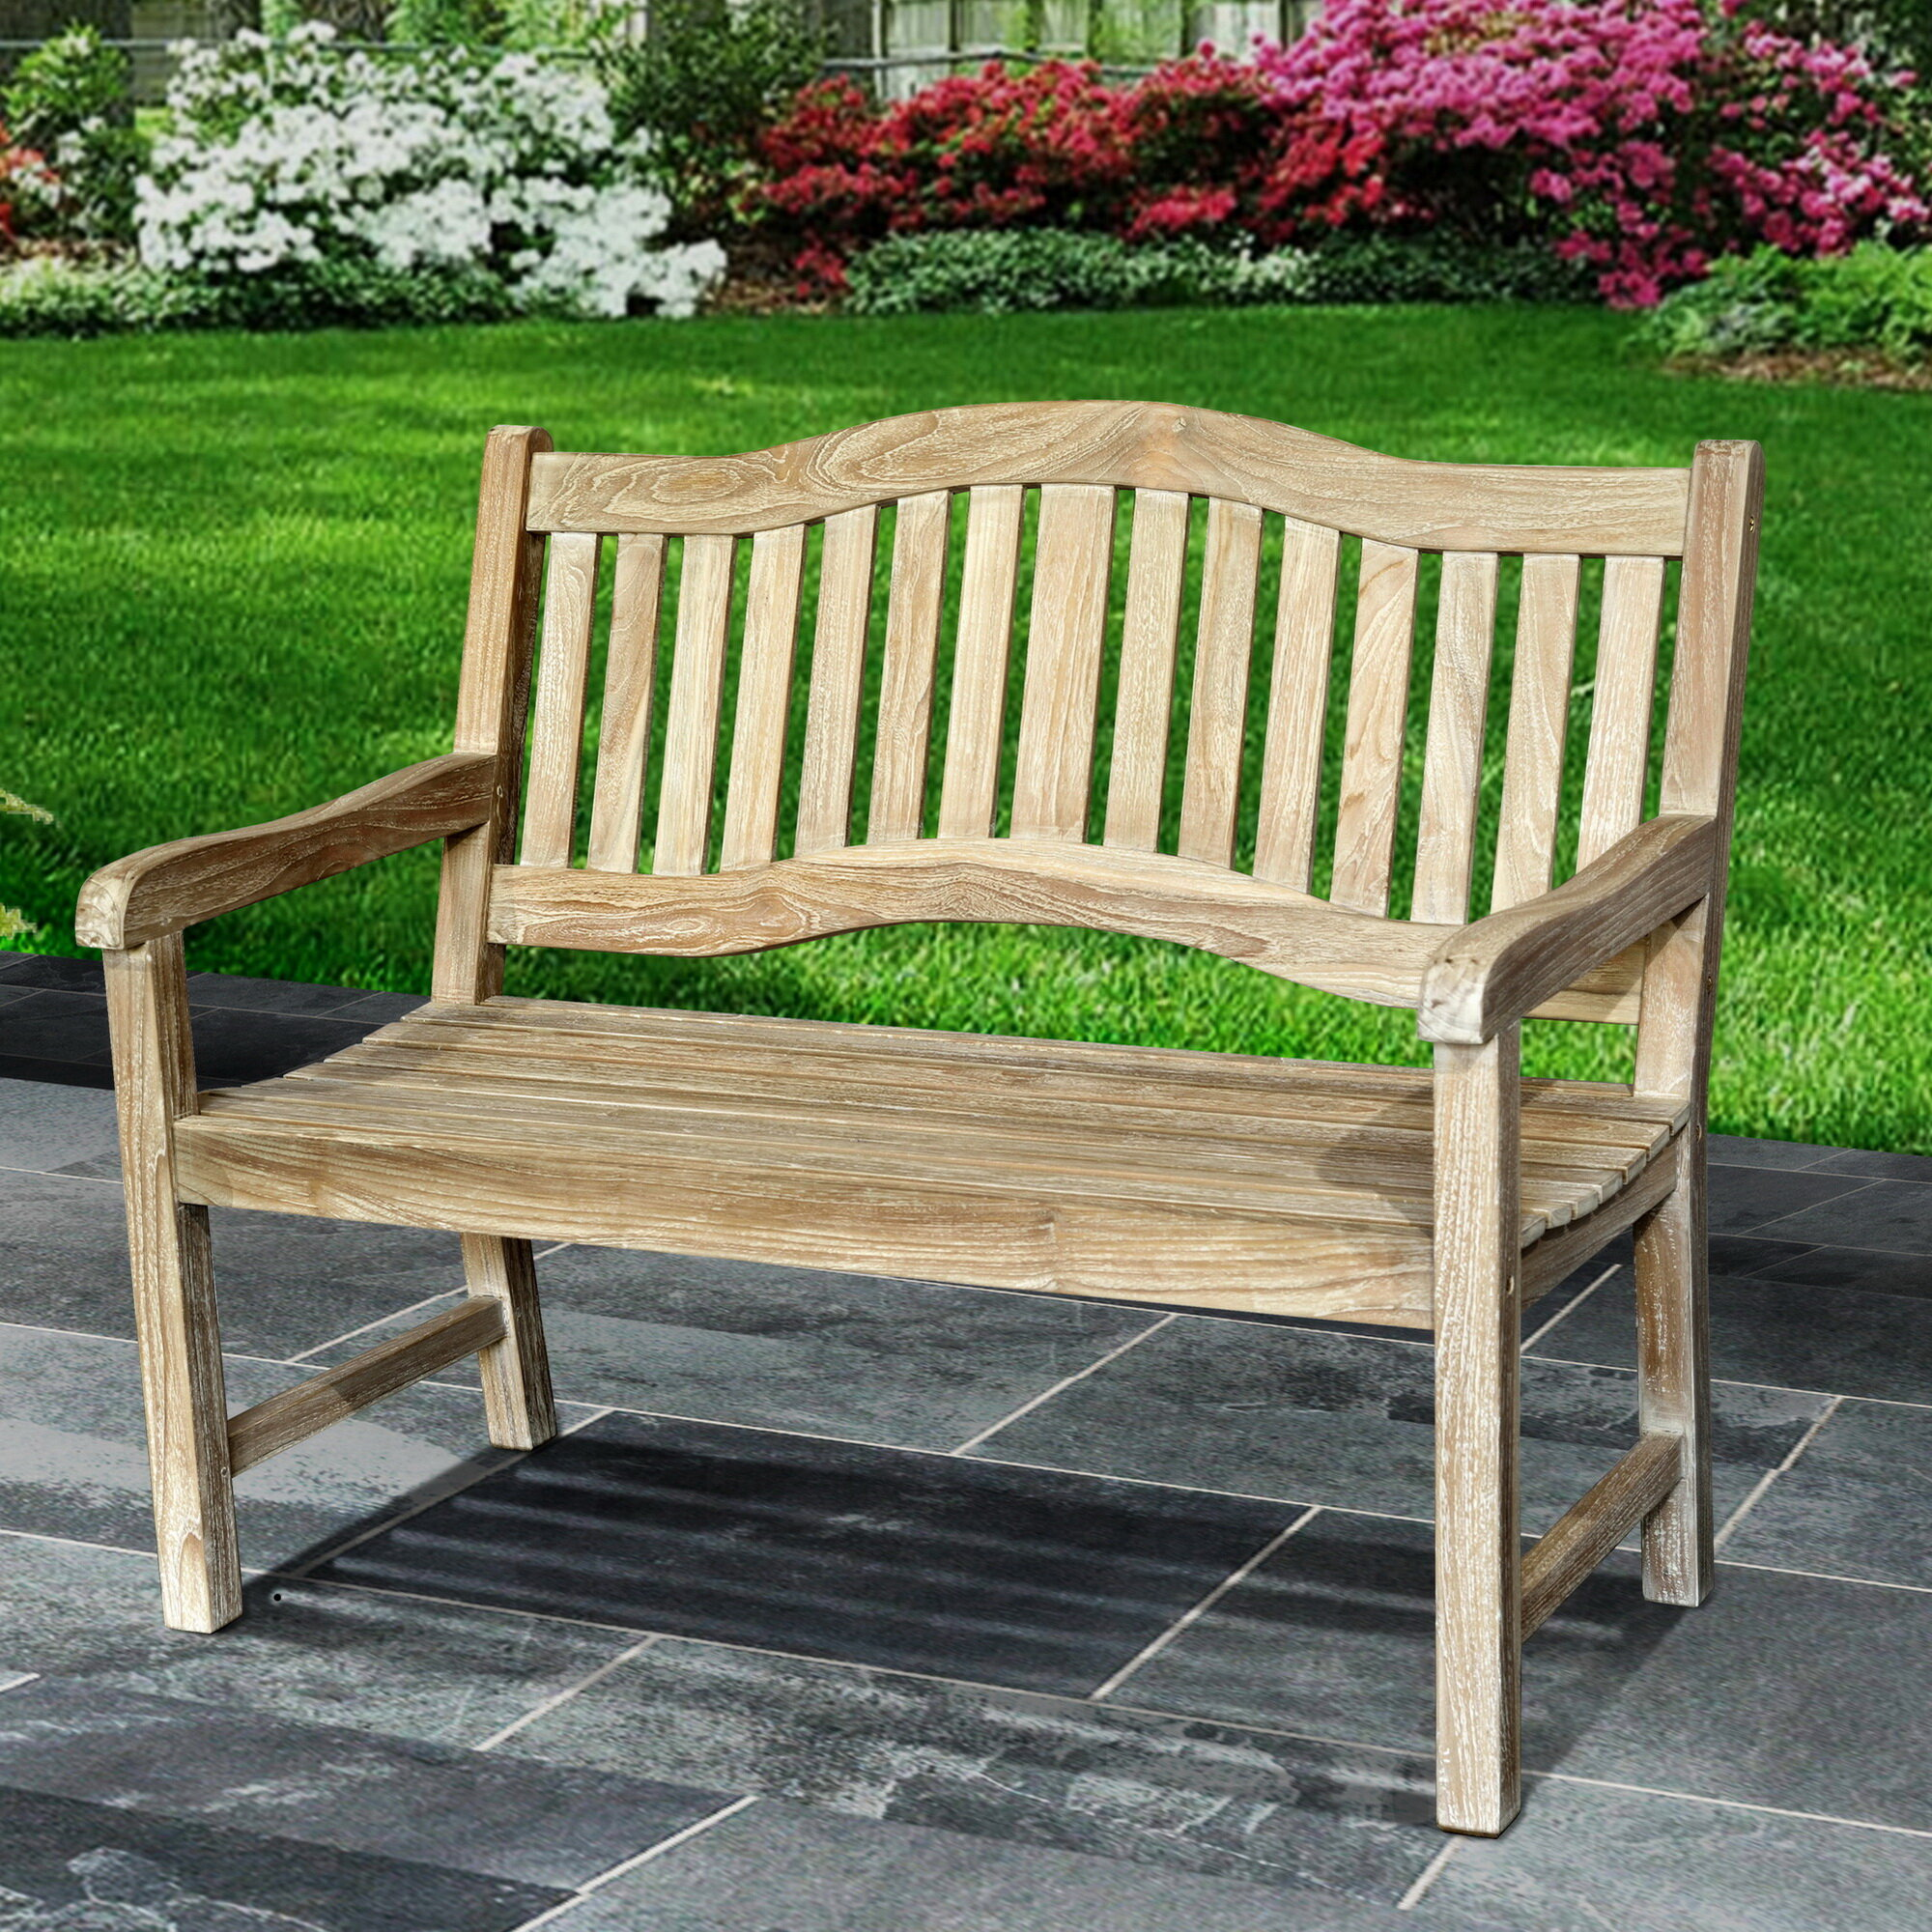 Remarkable Mcintyre Teak Park Bench Alphanode Cool Chair Designs And Ideas Alphanodeonline